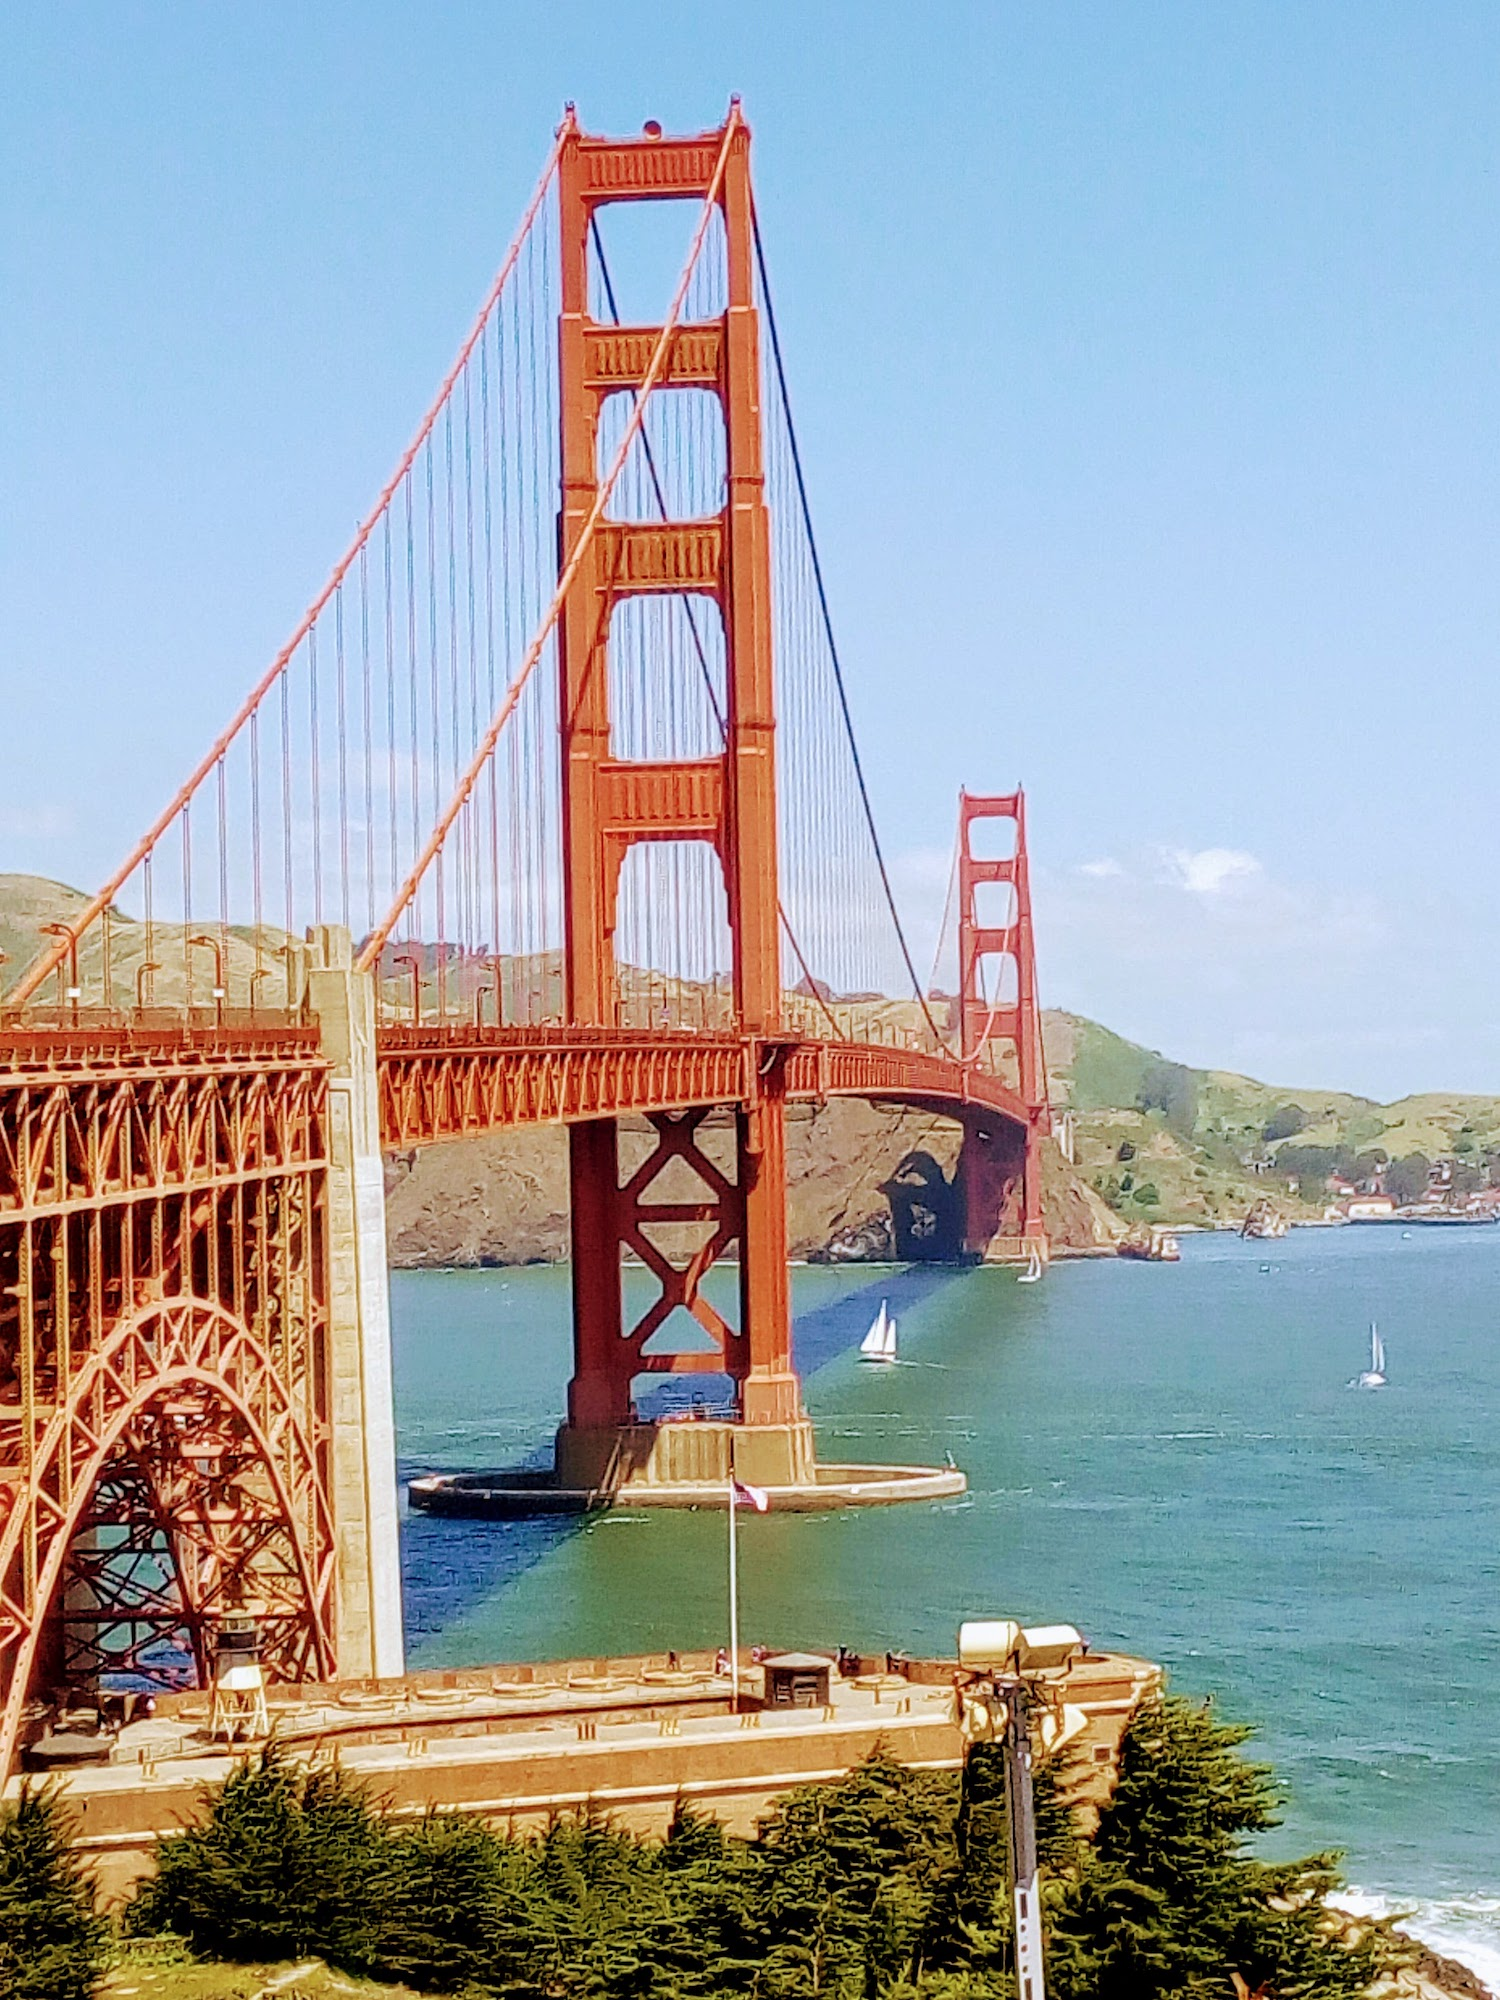 San Francisco Bay Area - the Bridge